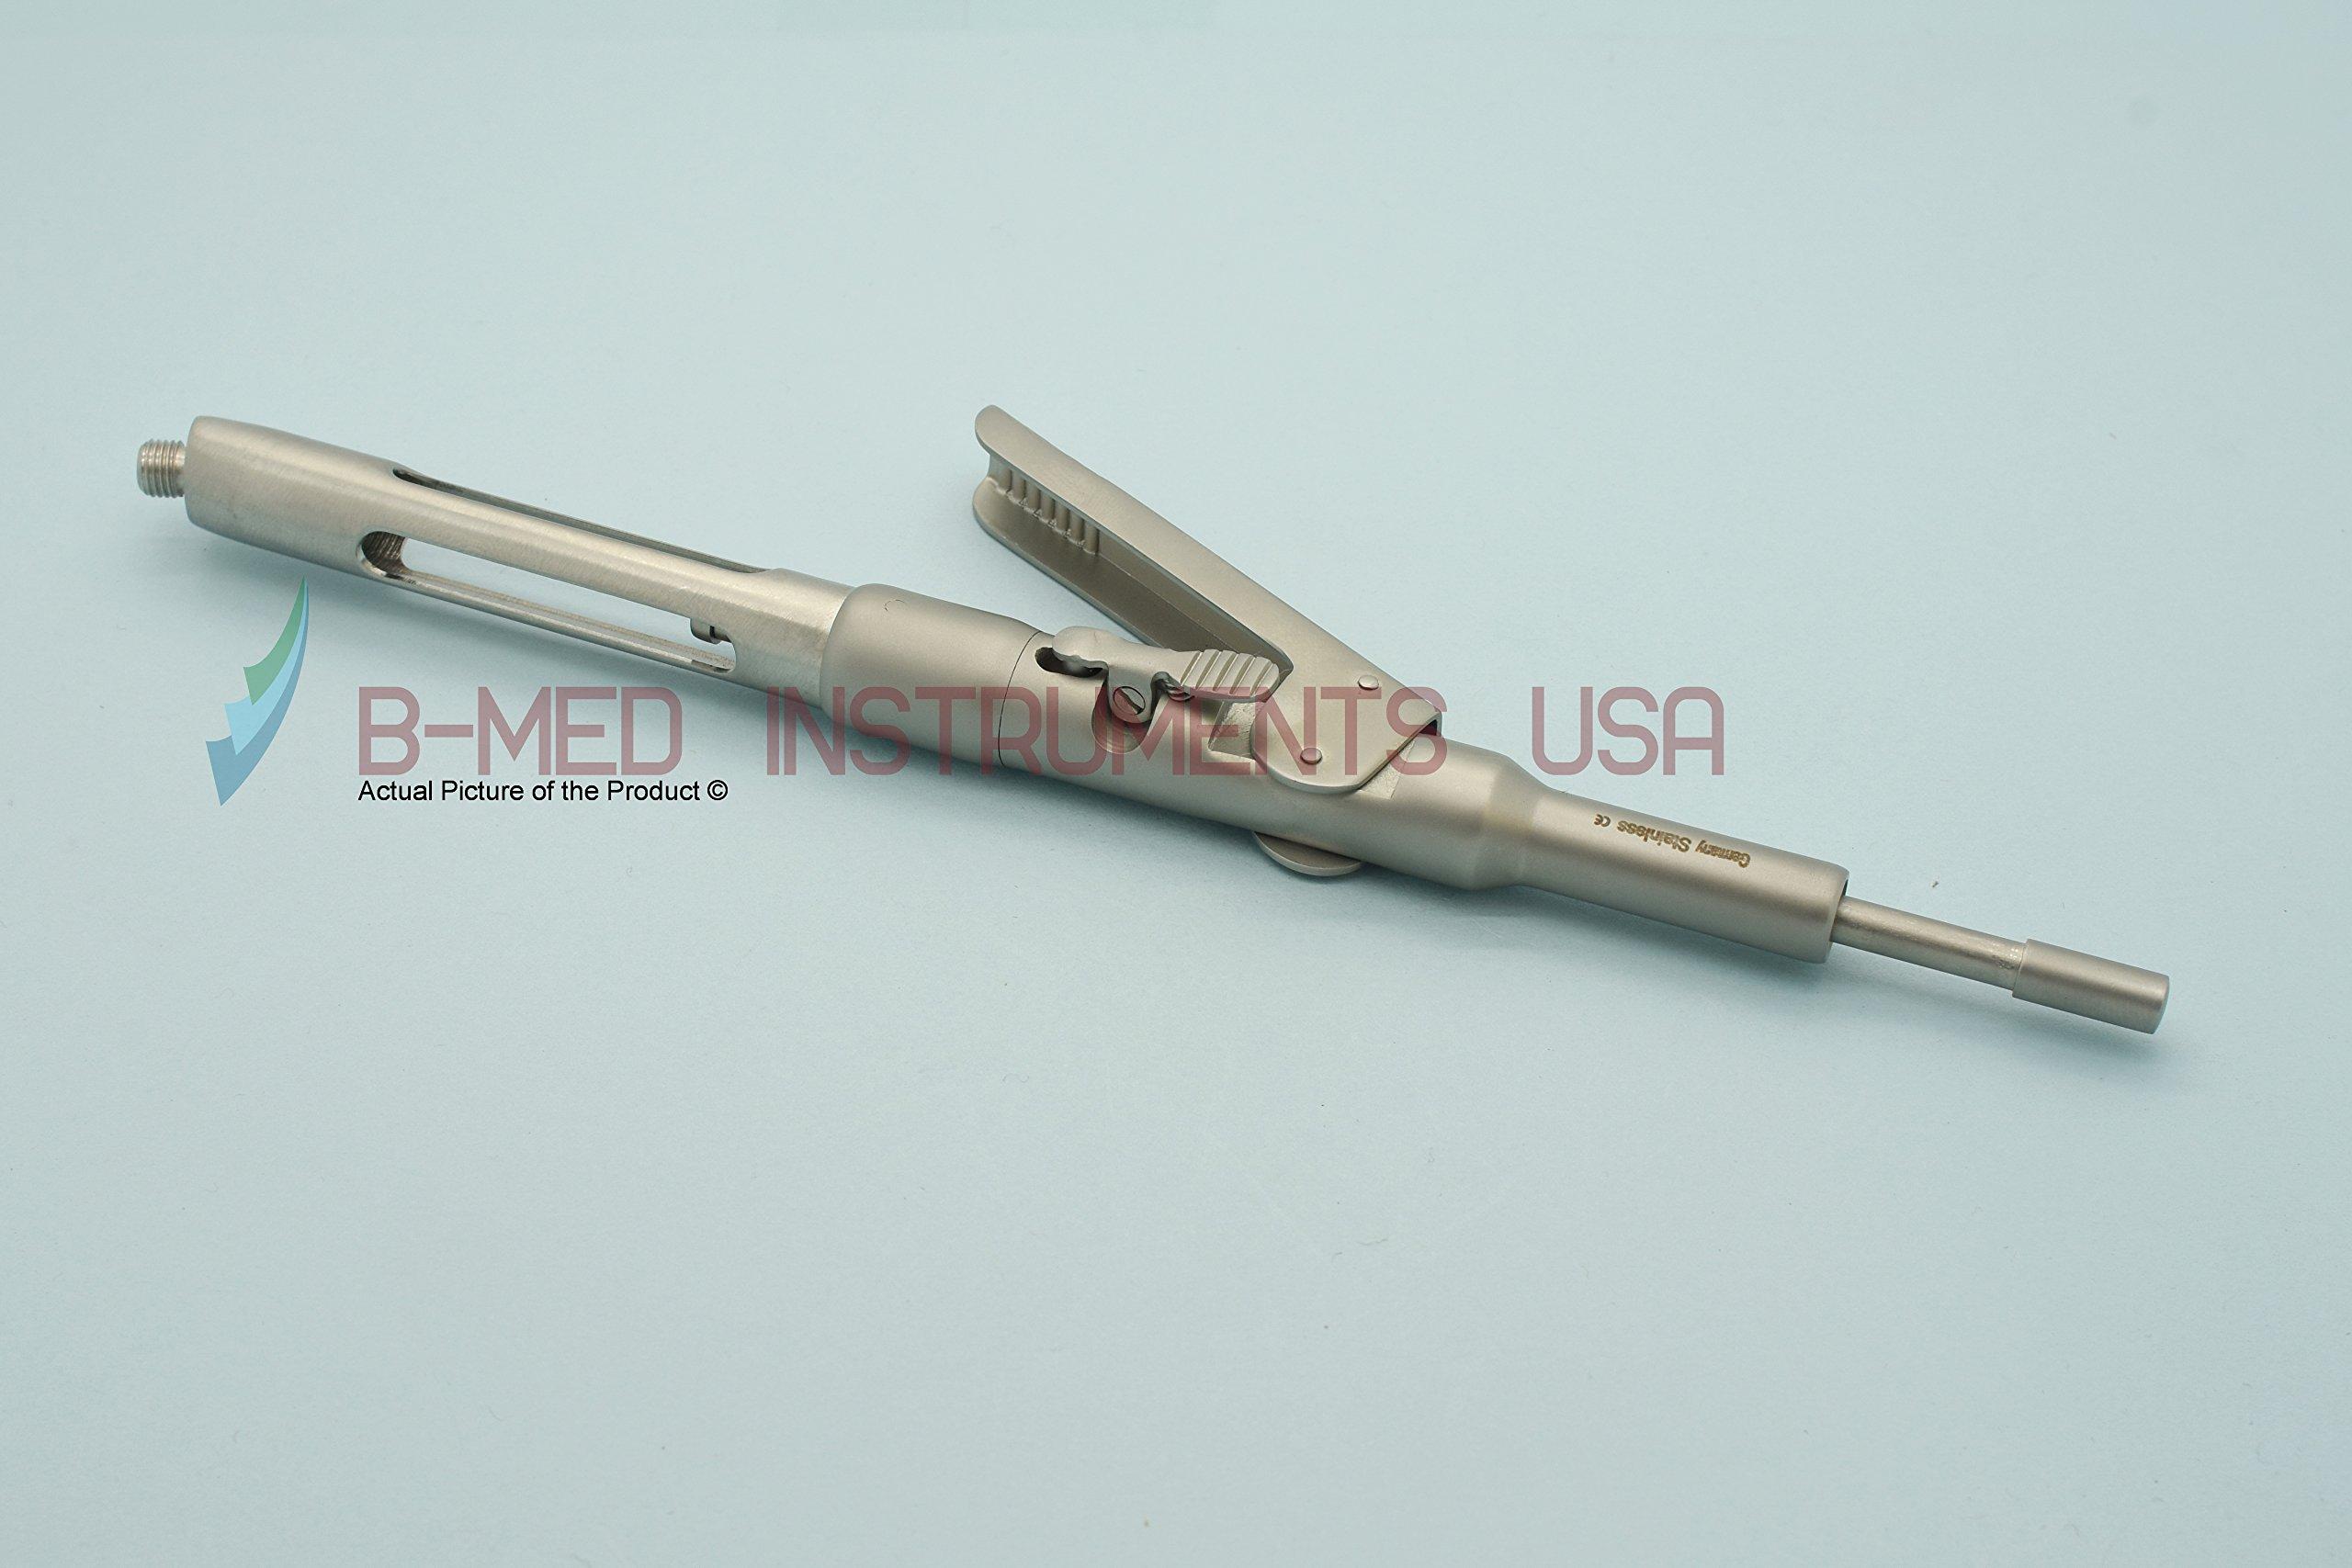 Intraligamental Syringe Pen Style Angled Tip 1.8 ML